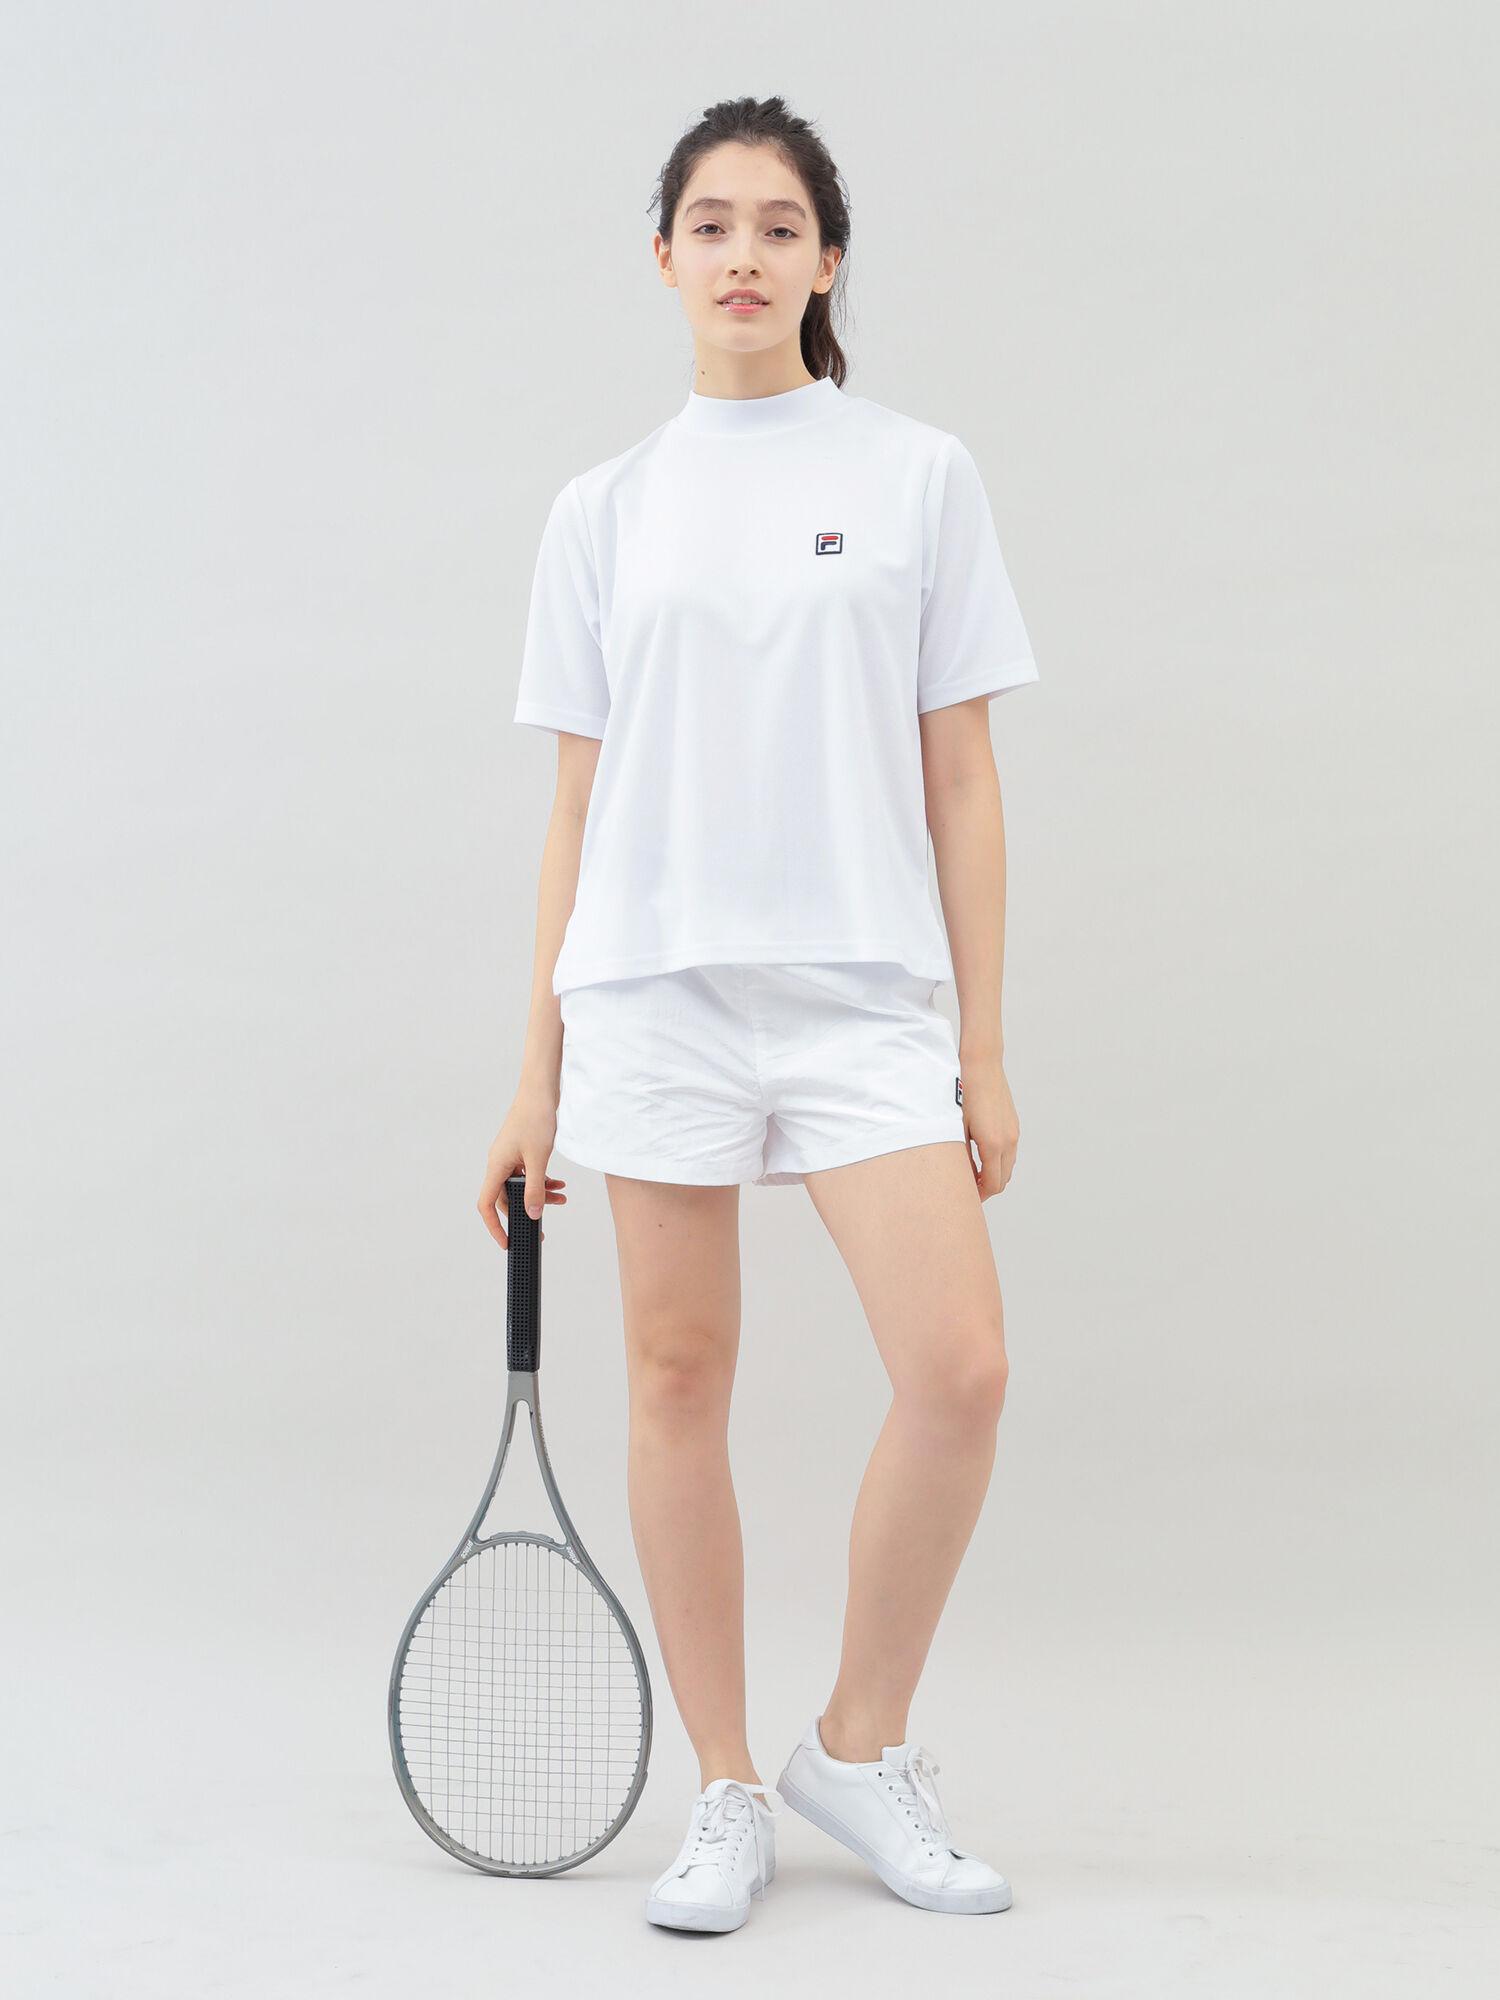 FILAレディーステニスTシャツ